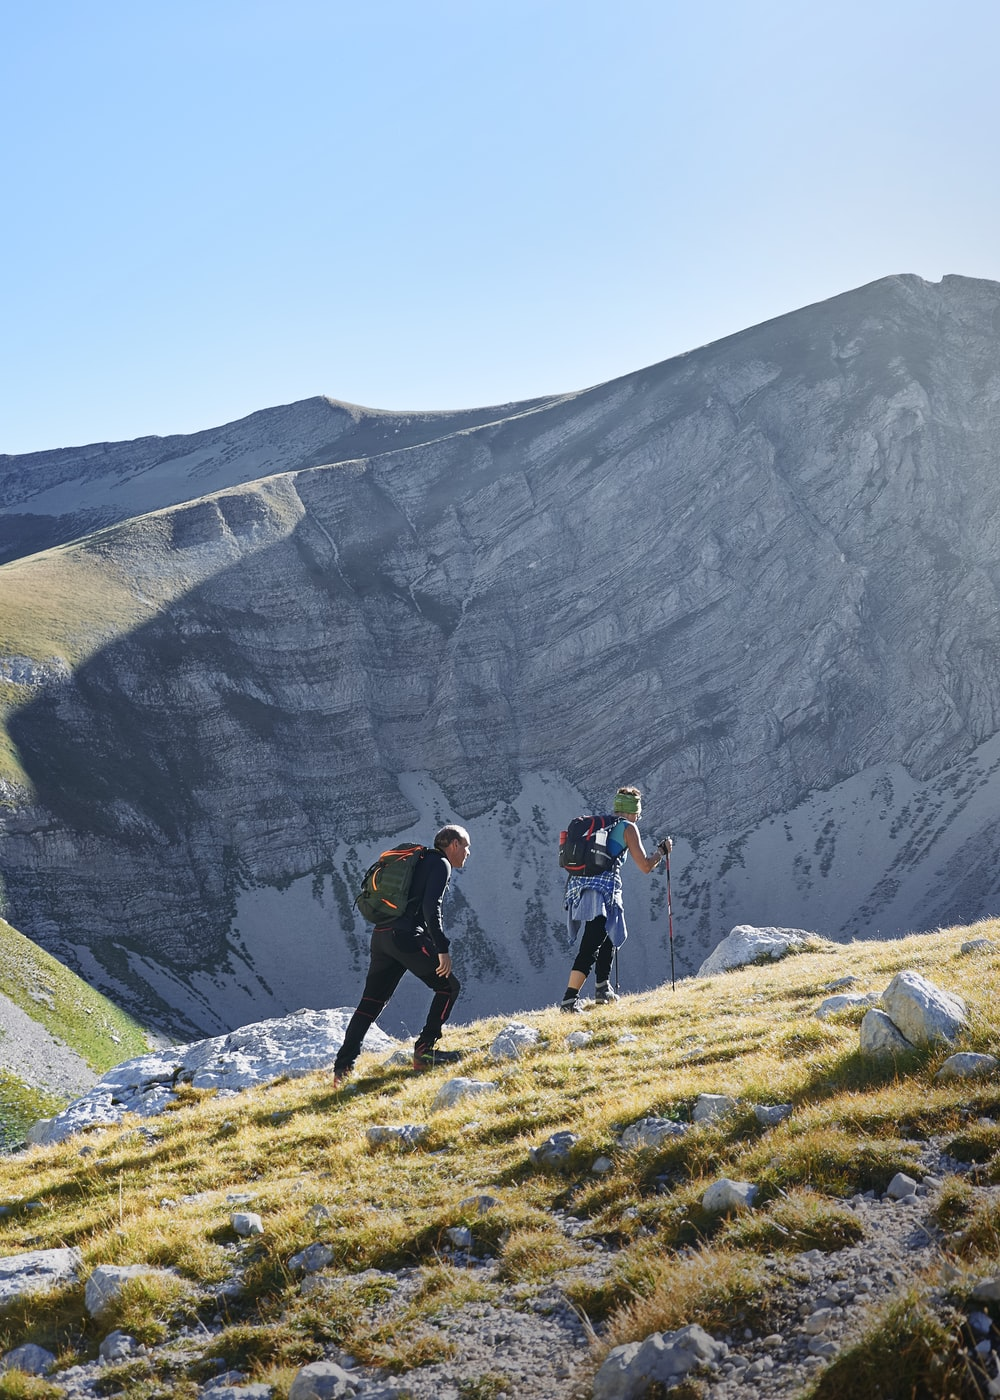 two people walking on mountain